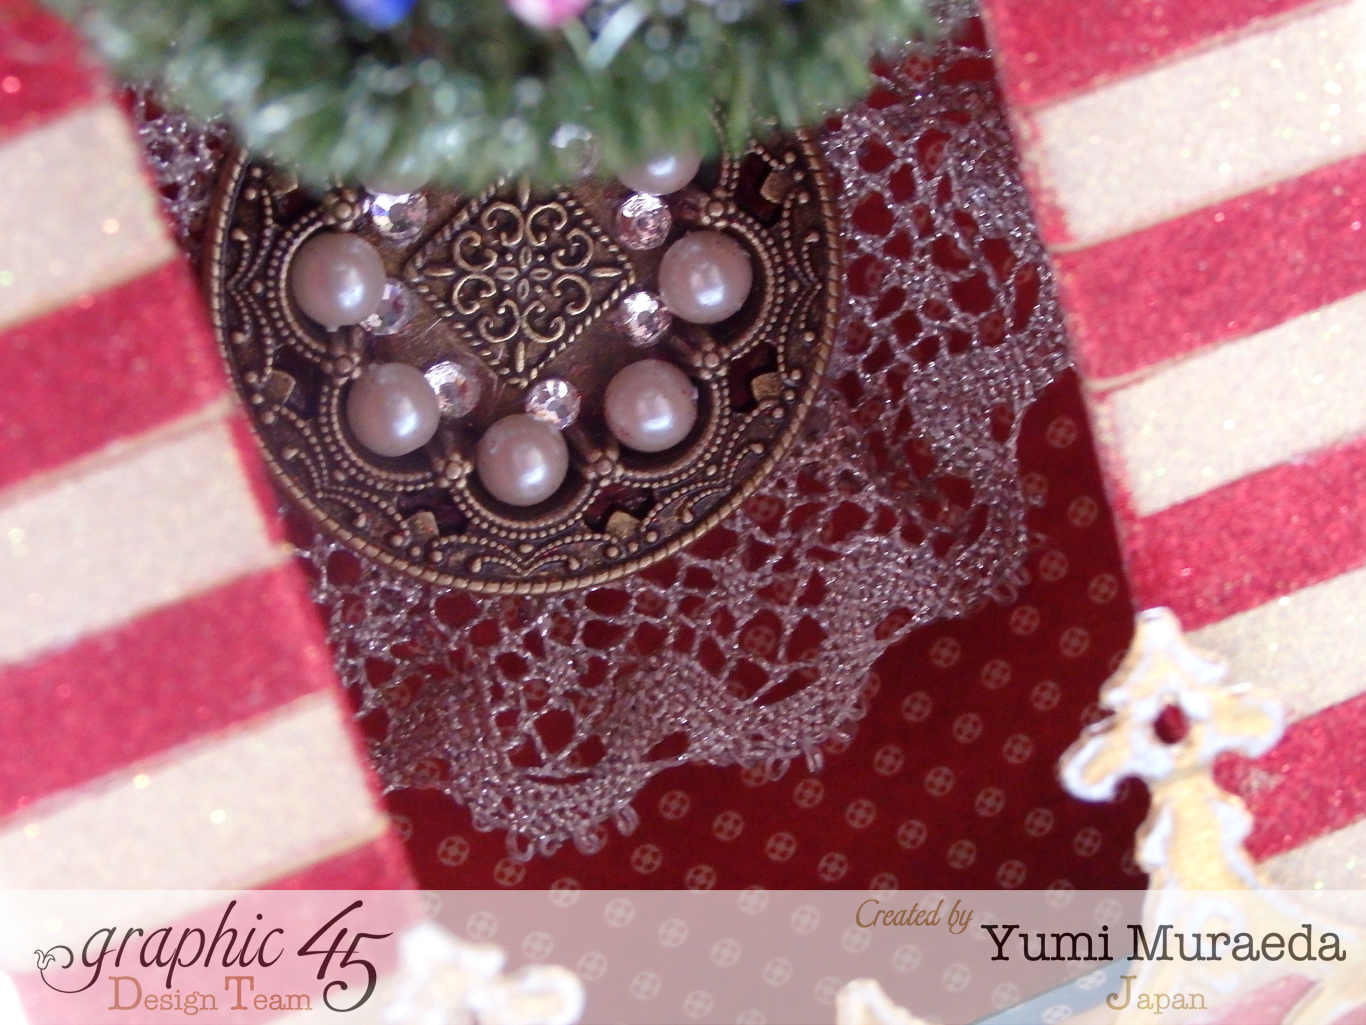 yuyu3christmaskeyholderhouse11.jpg